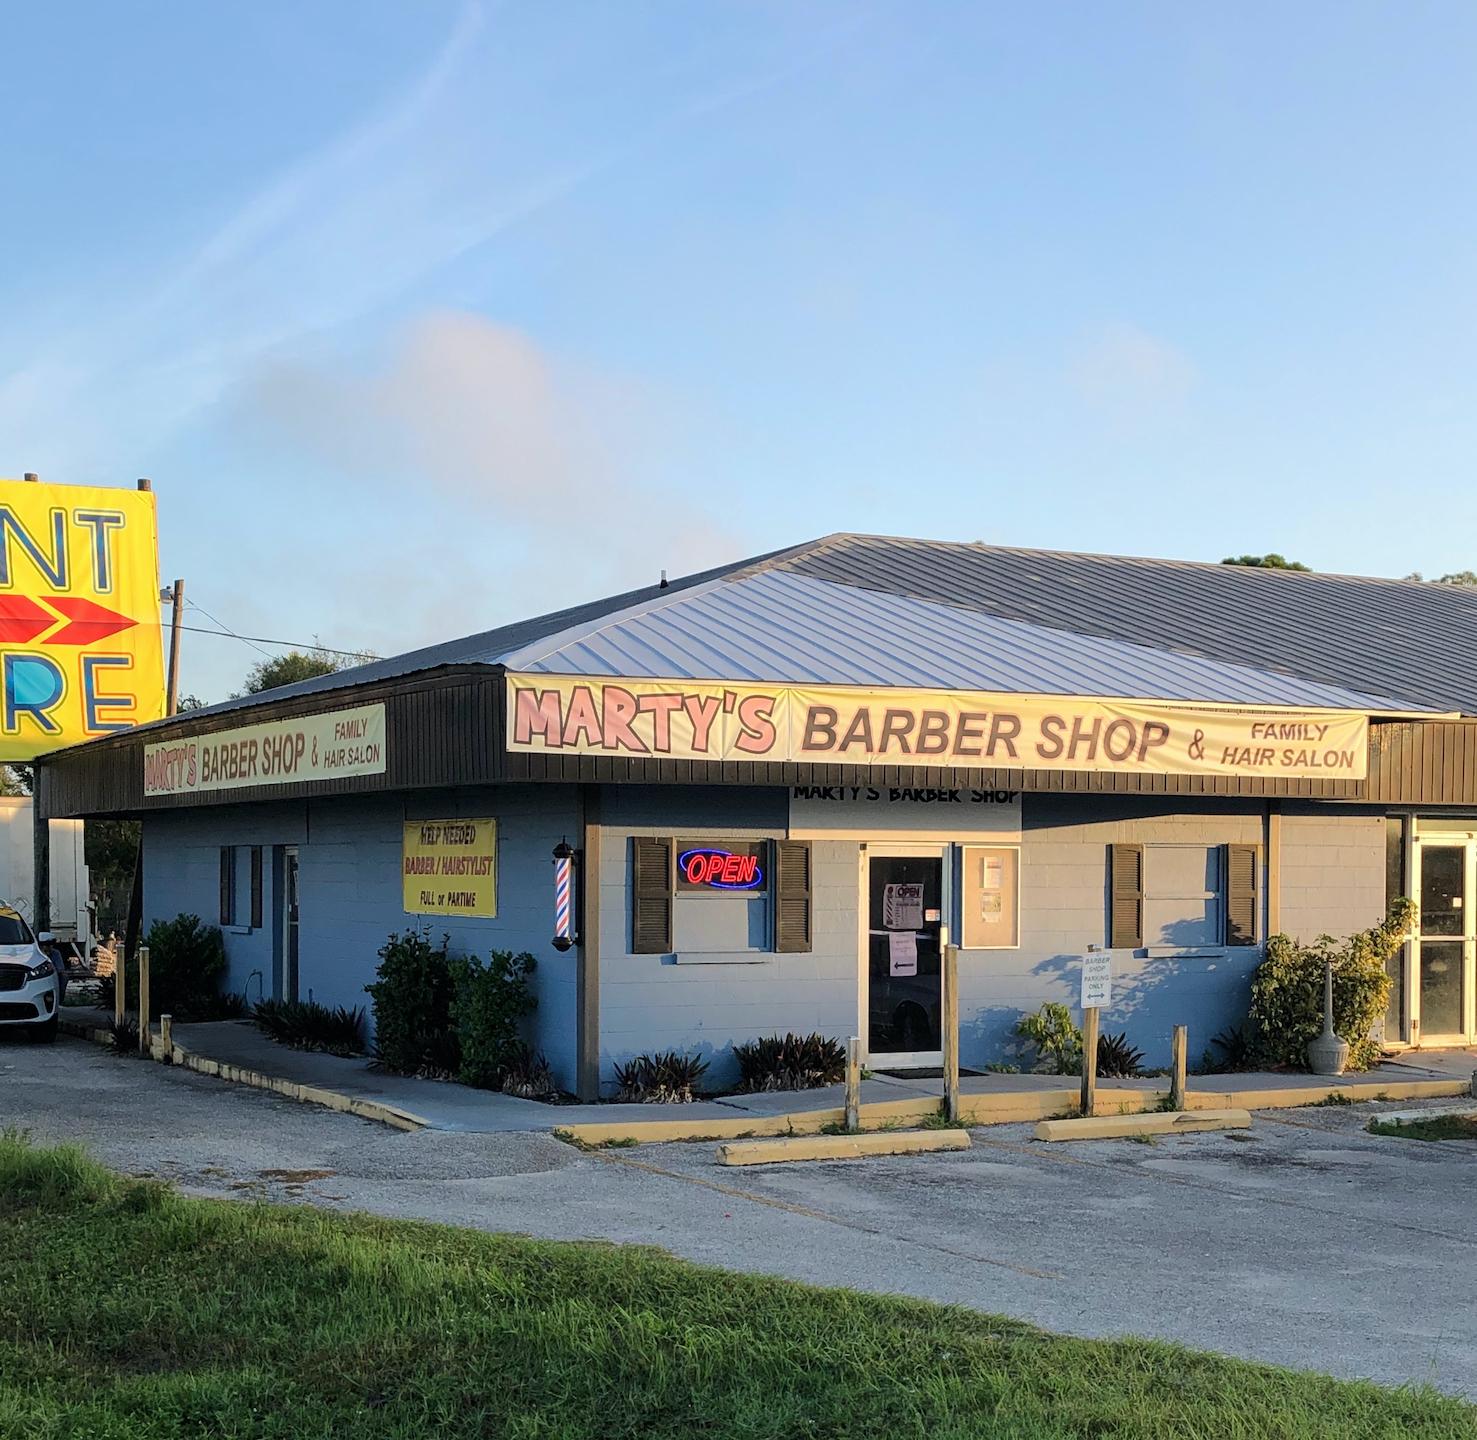 Marty's Barber Shop